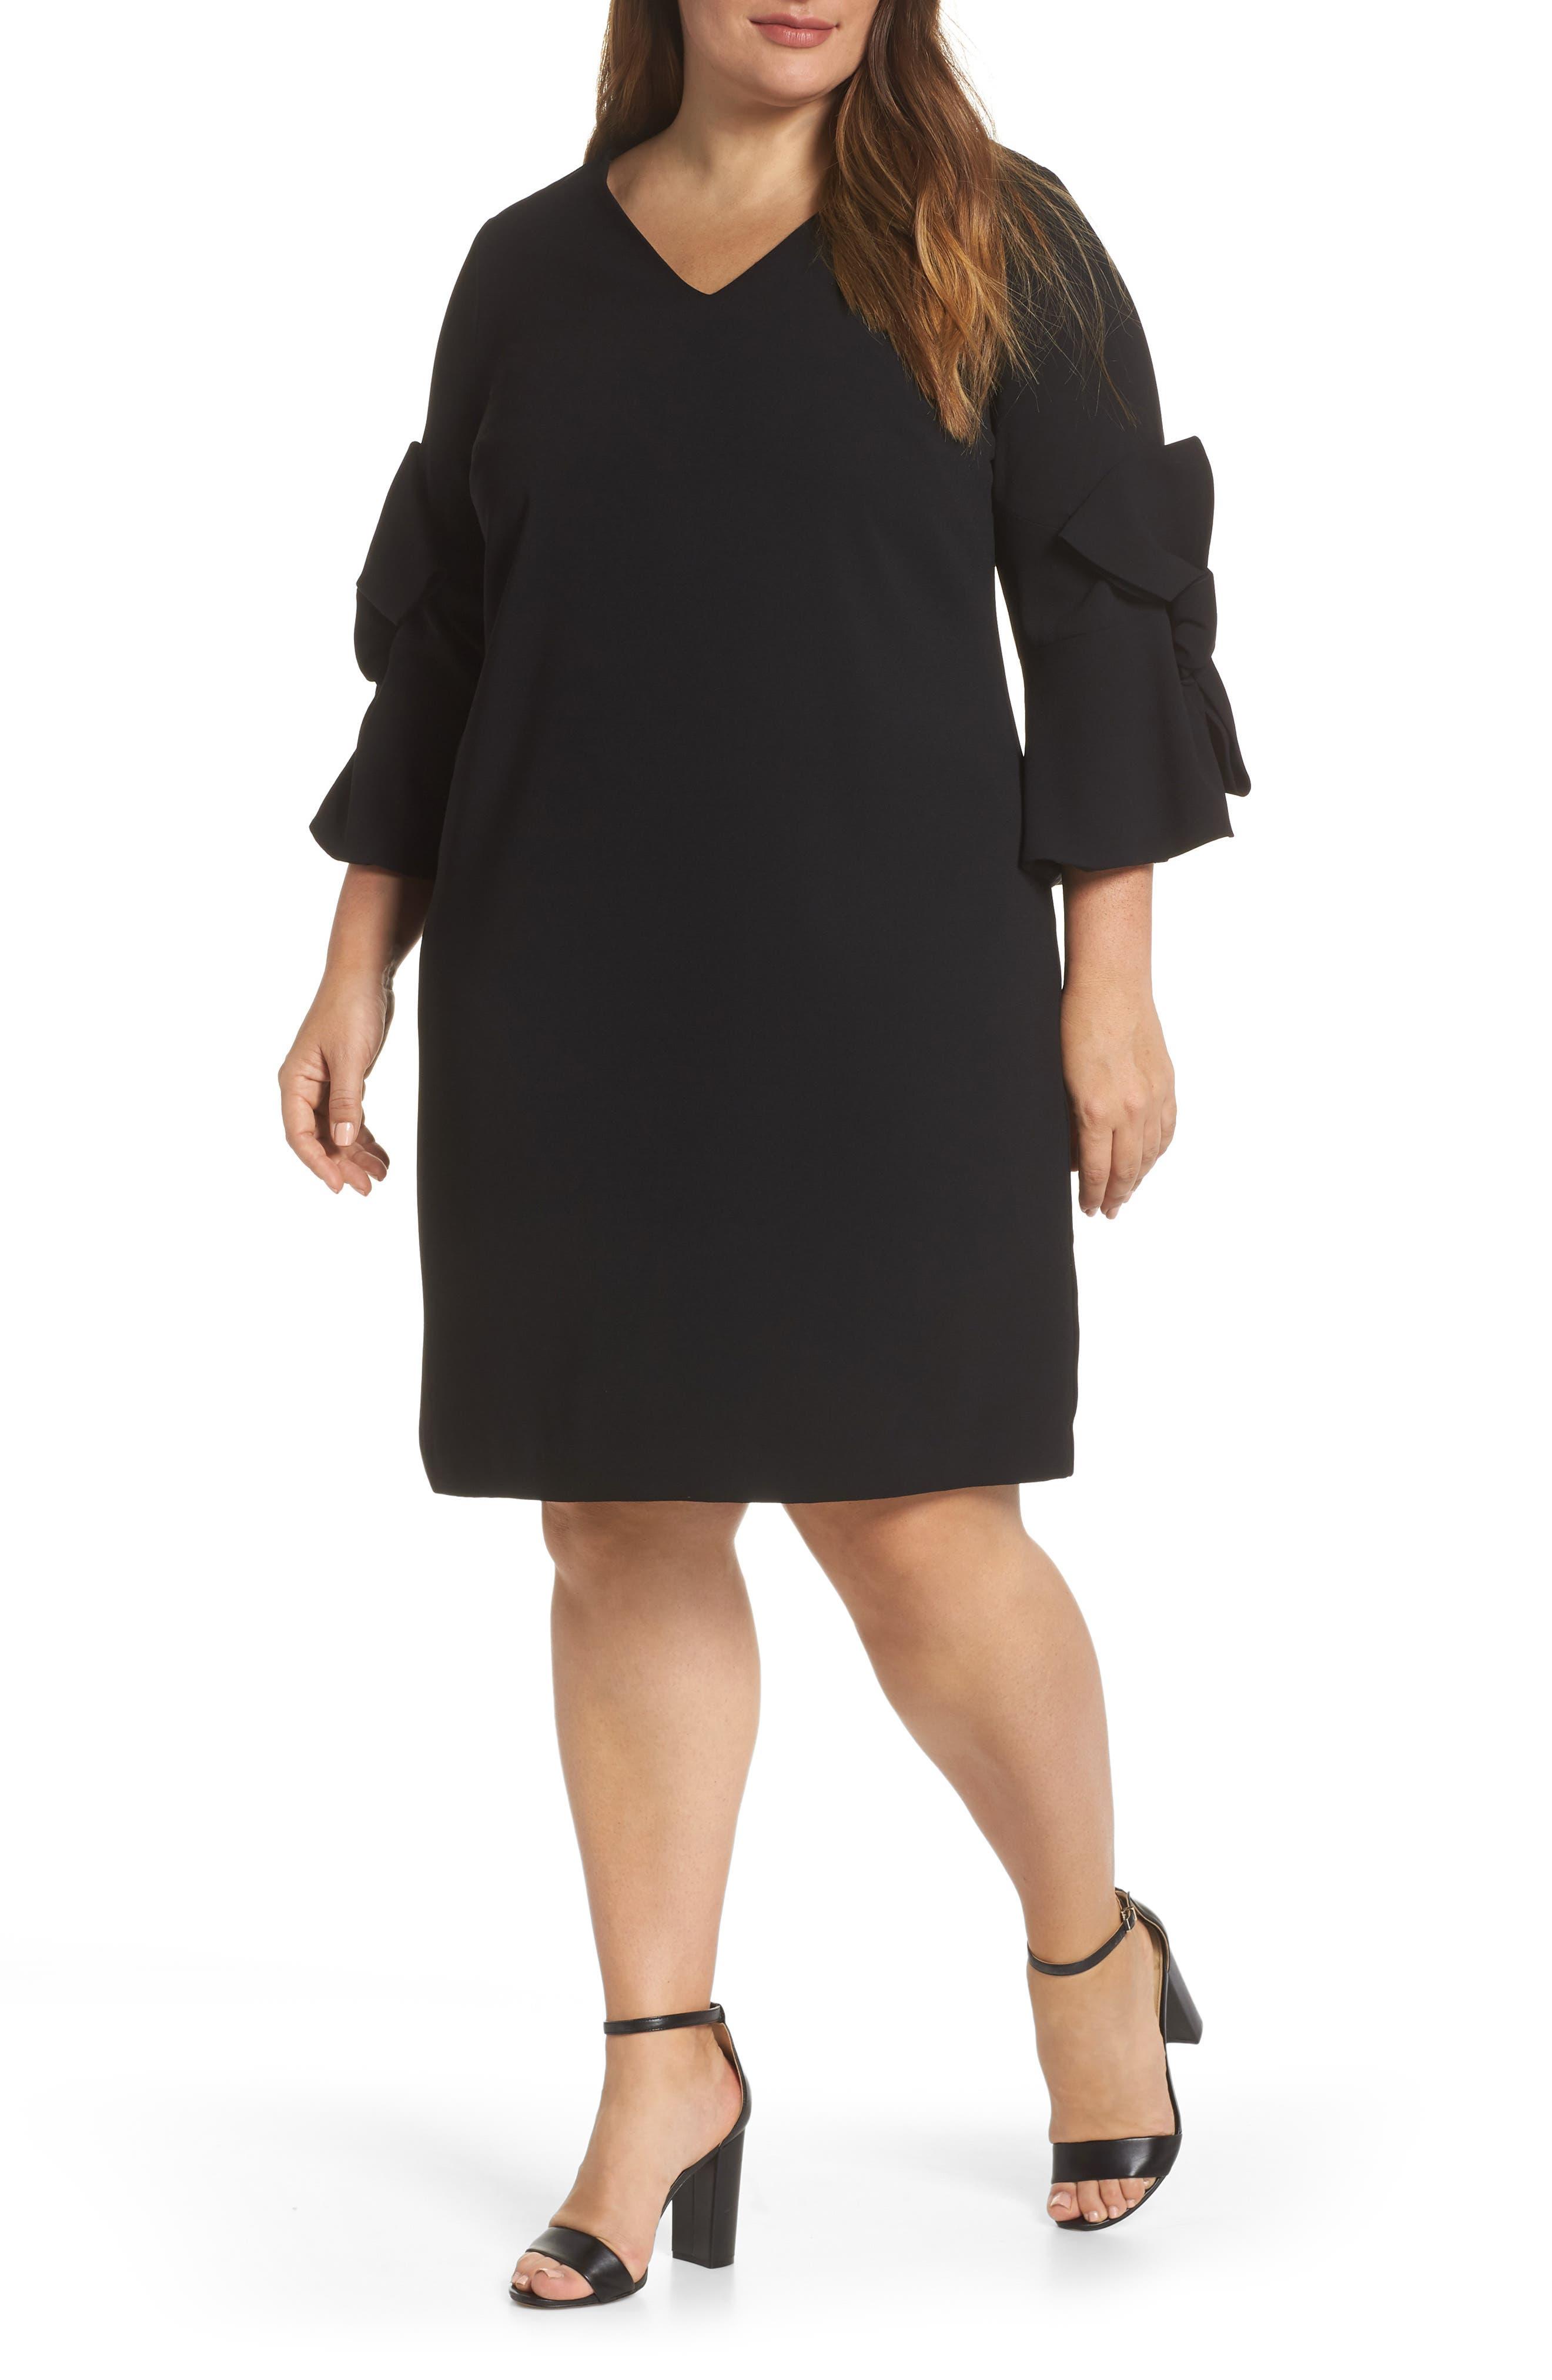 Moss Crepe Bow Shift Dress,                             Main thumbnail 1, color,                             RICH BLACK